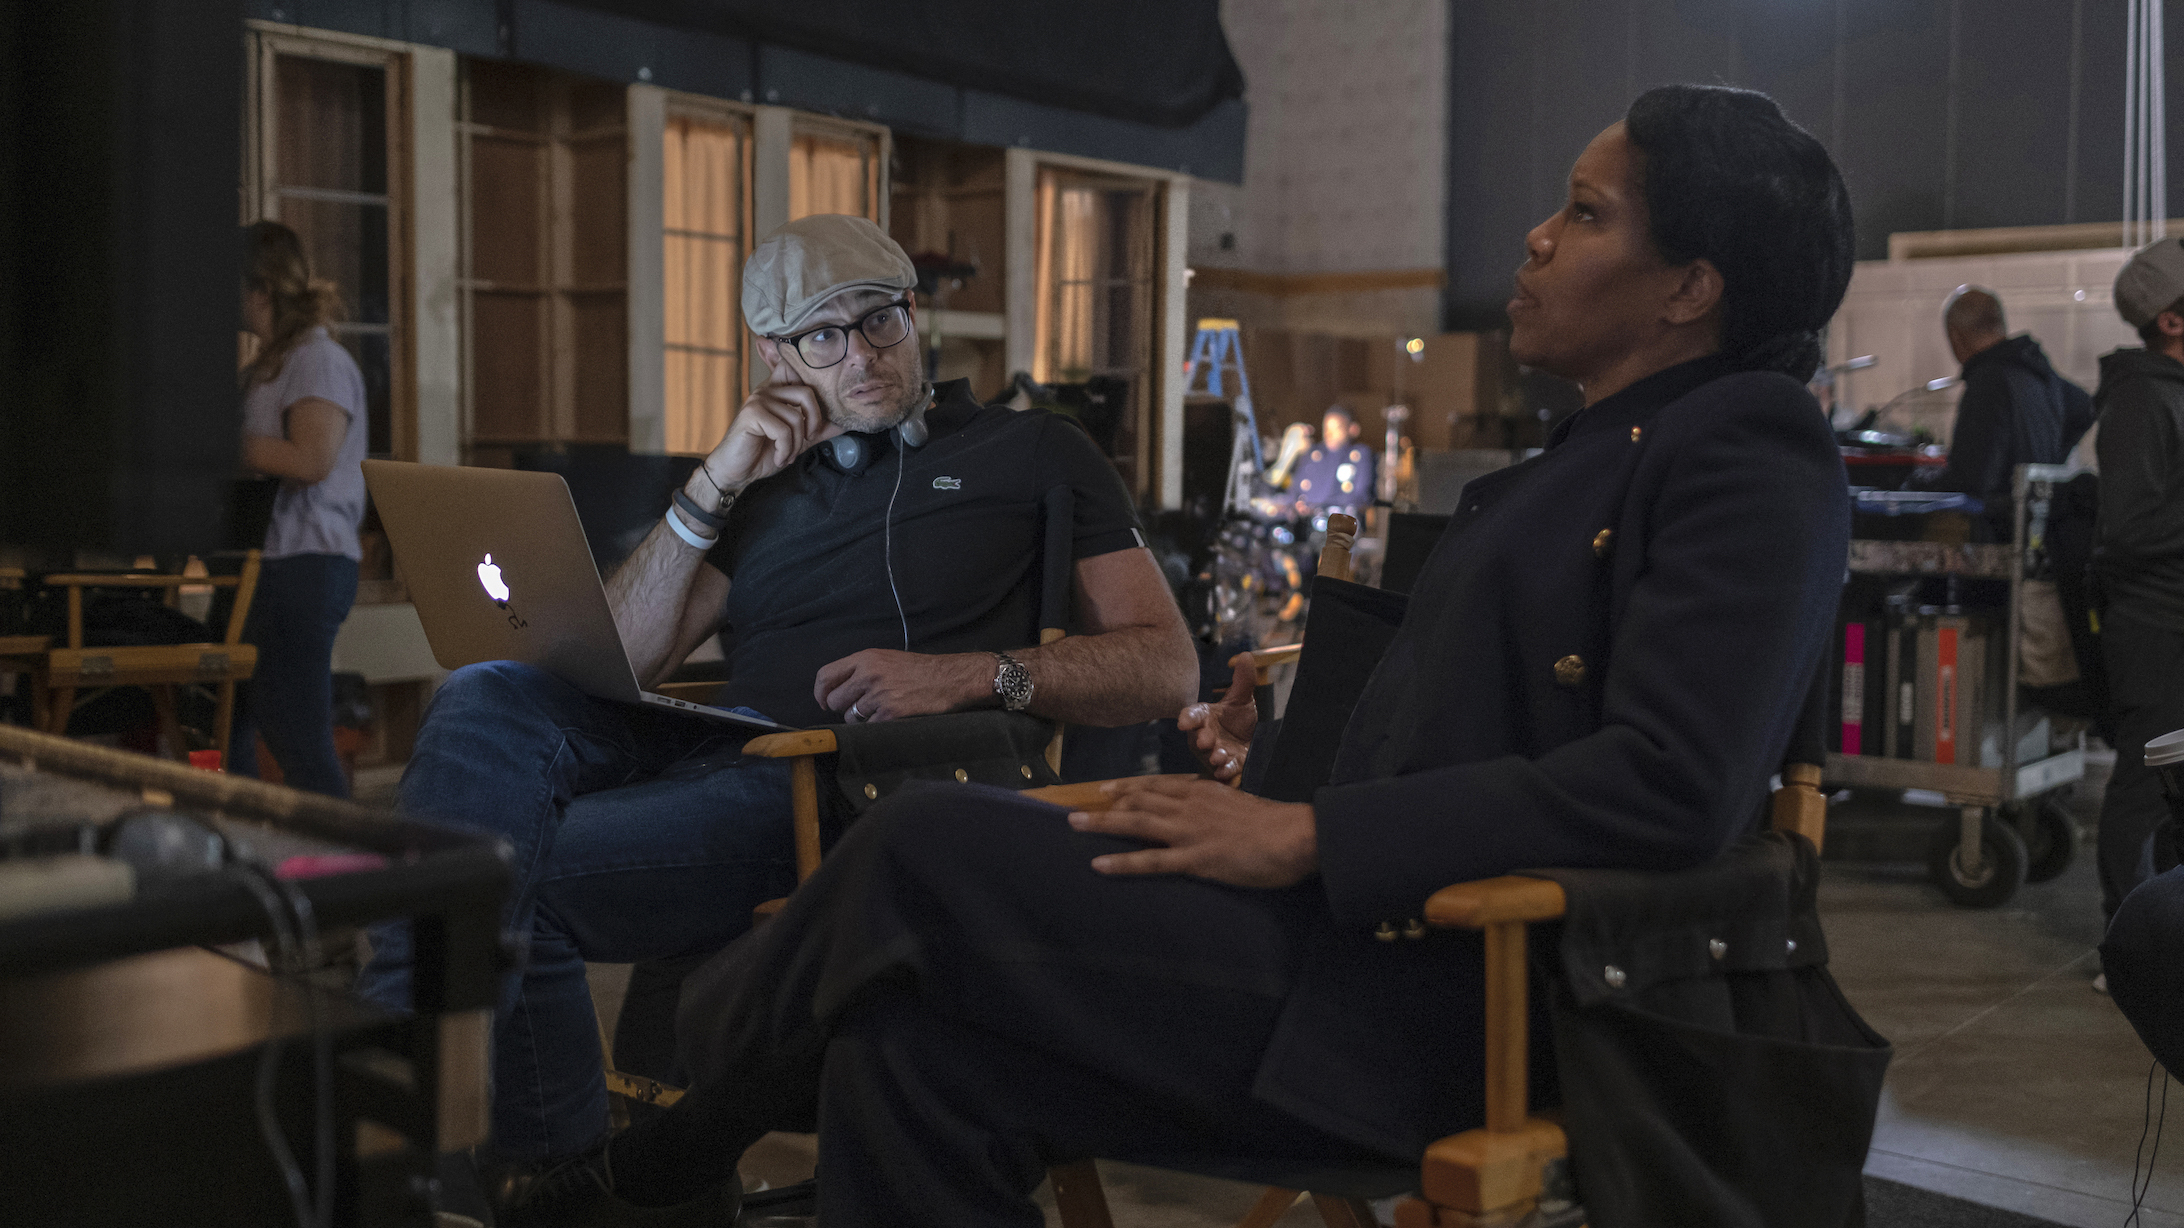 'Watchmen' Creator Damon Lindelof: Not Talking About Race Felt 'Irresponsible'